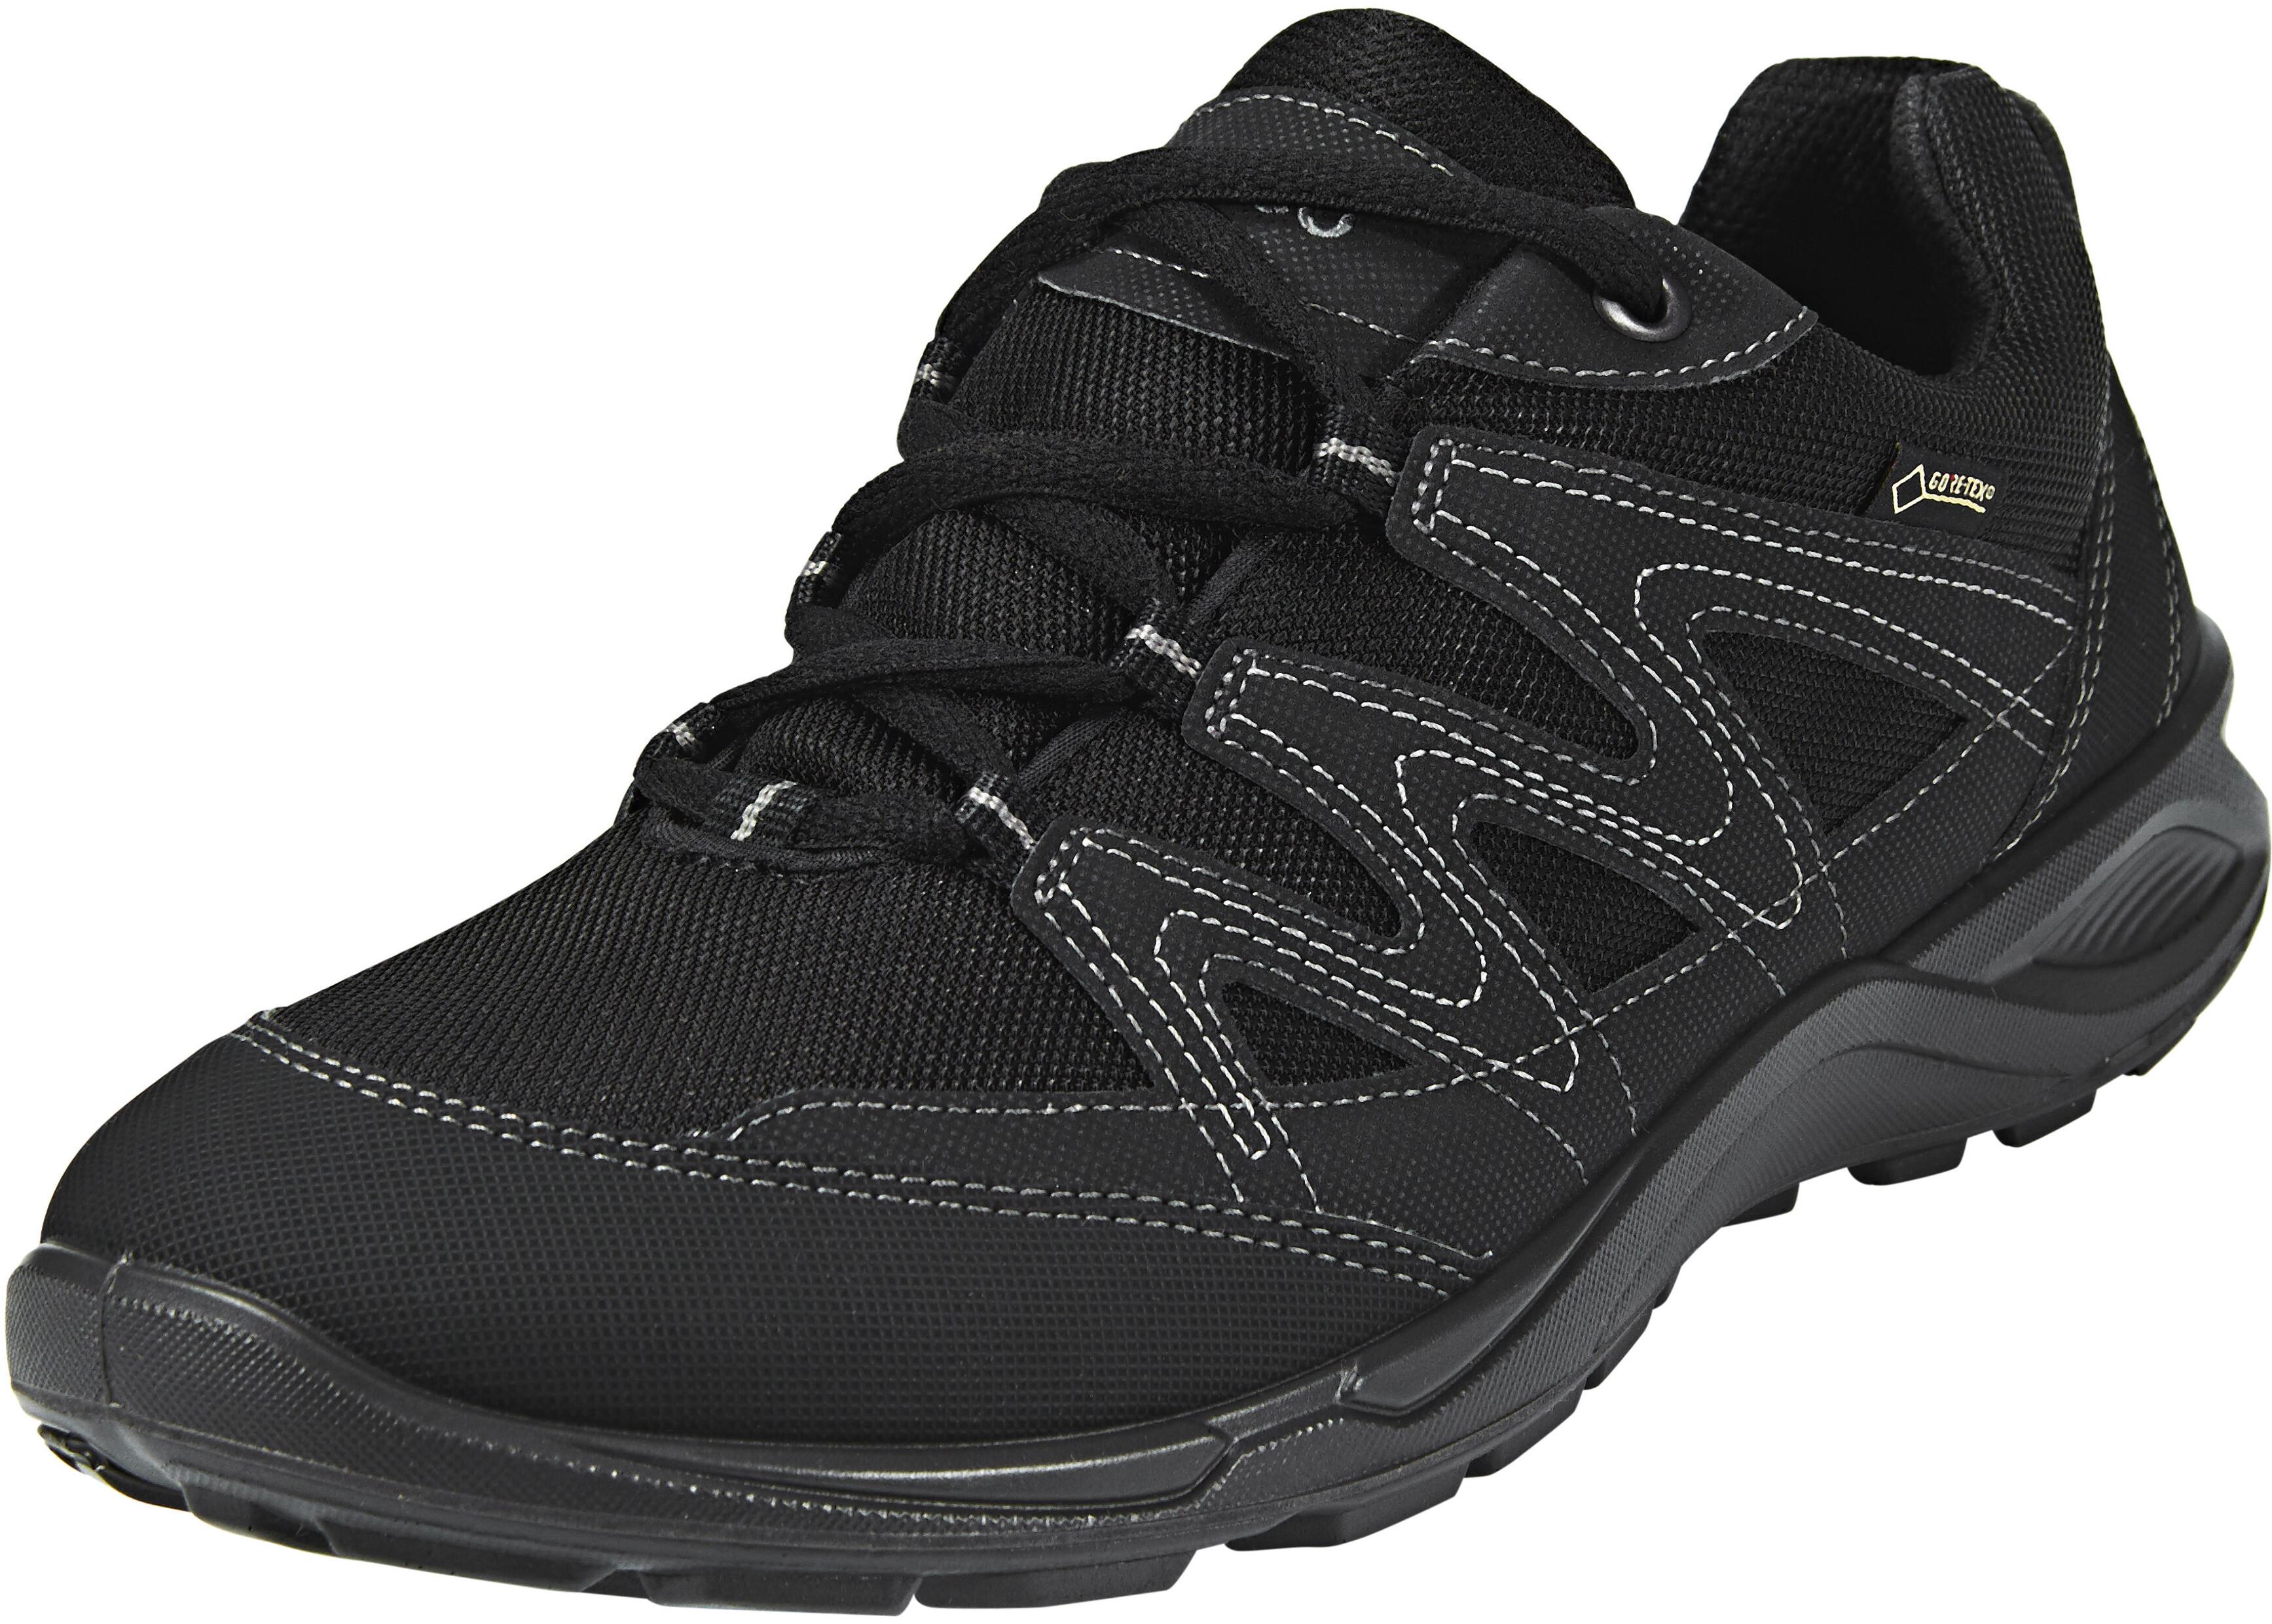 796b4744301387 ECCO Terracruise LT Shoes Damen black black